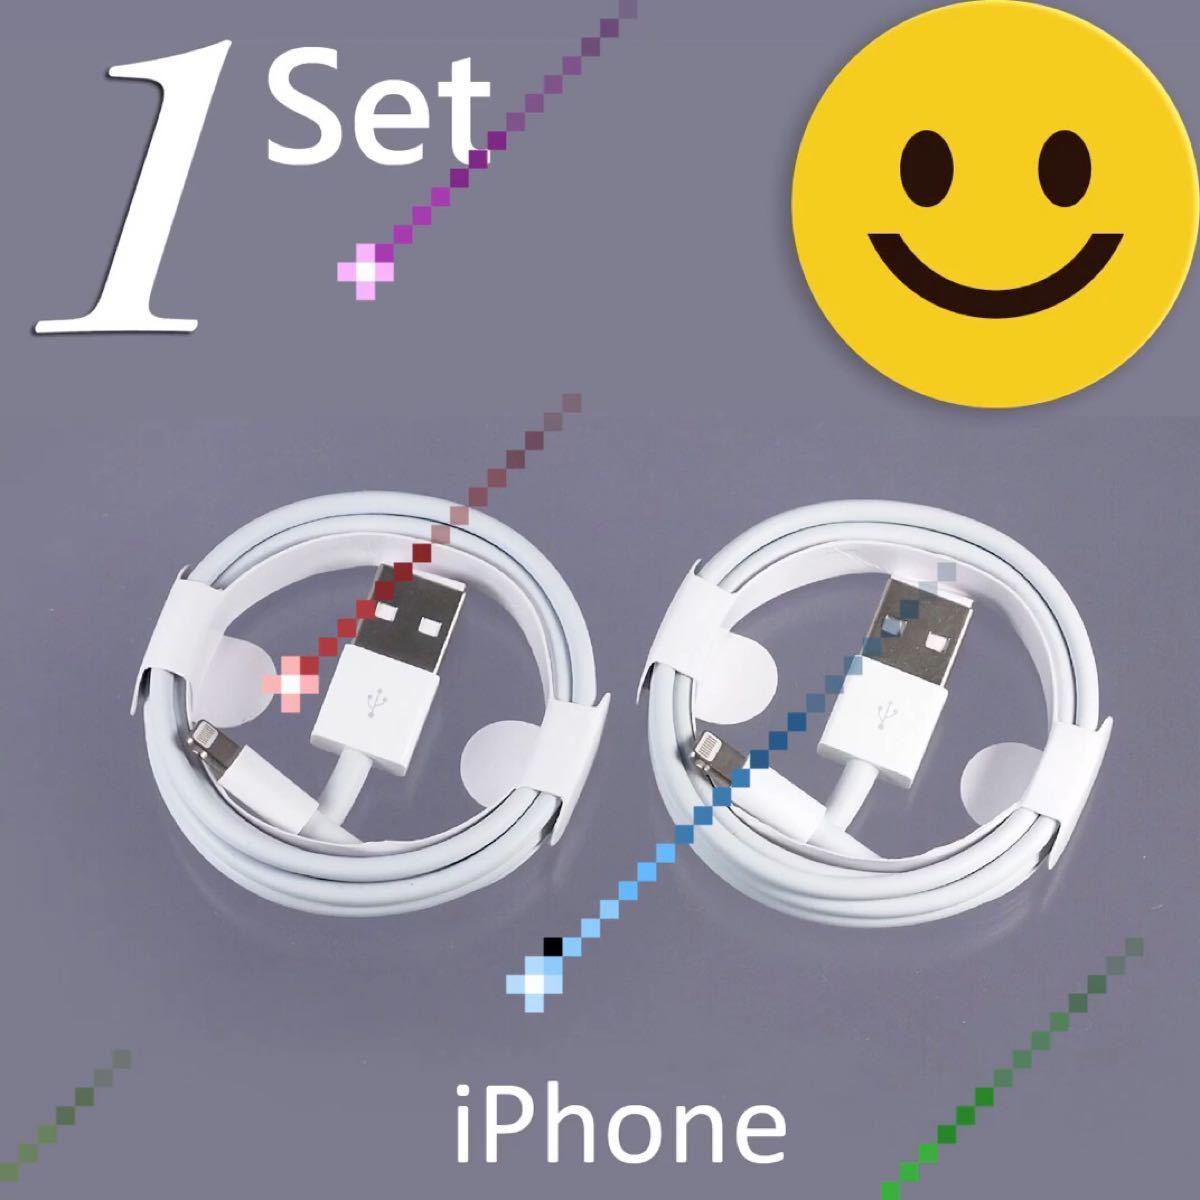 iPhone 充電器 充電ケーブル lightning cable ライトニングケーブル 高速充電 急速充電 データ転送 高品質